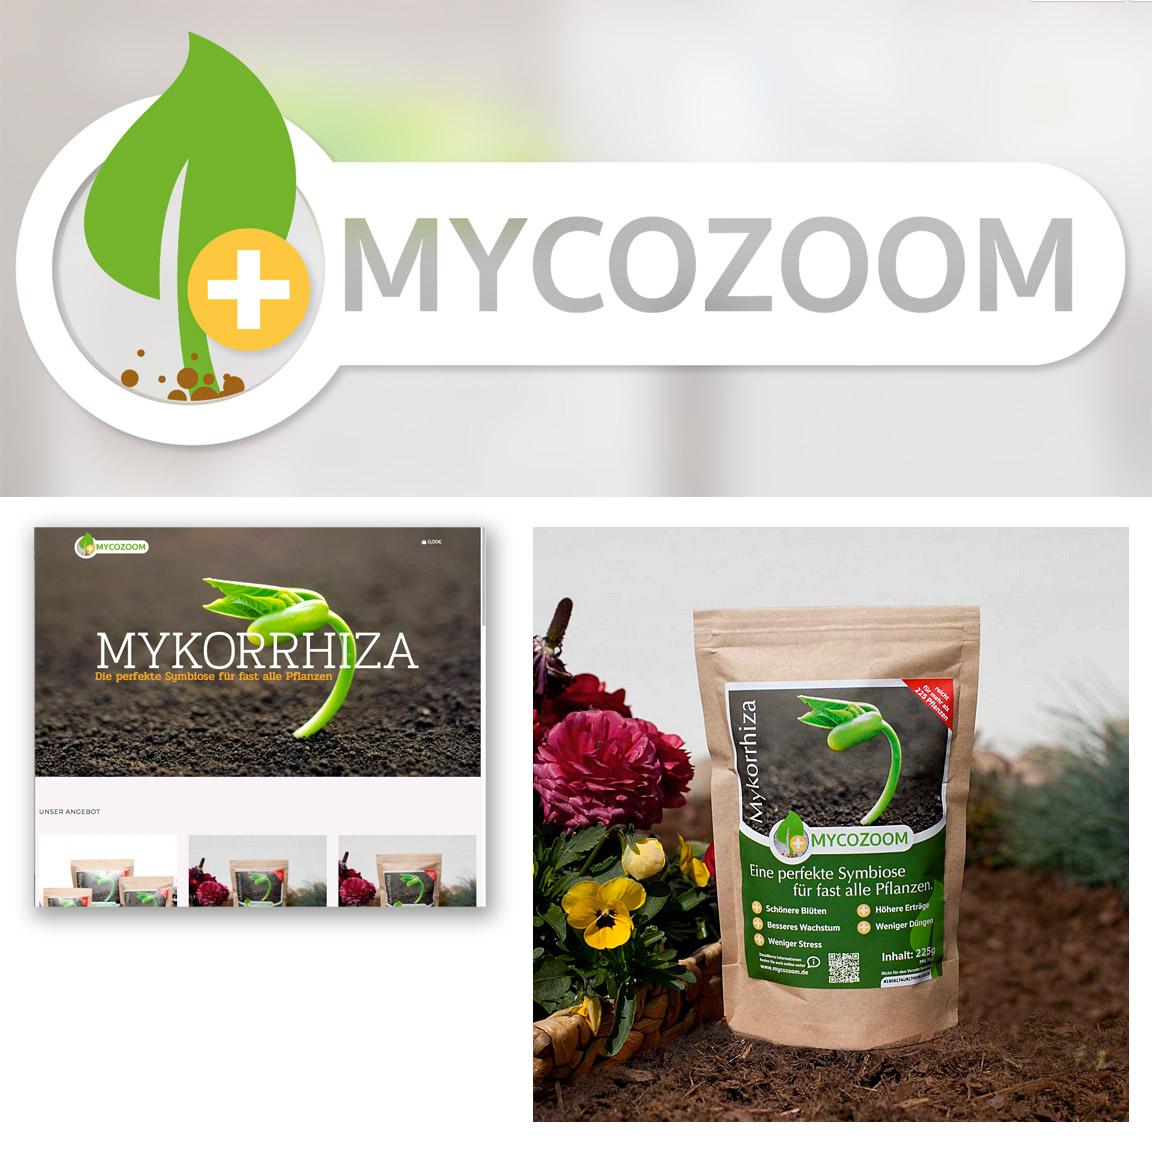 www.mycozoom.de online